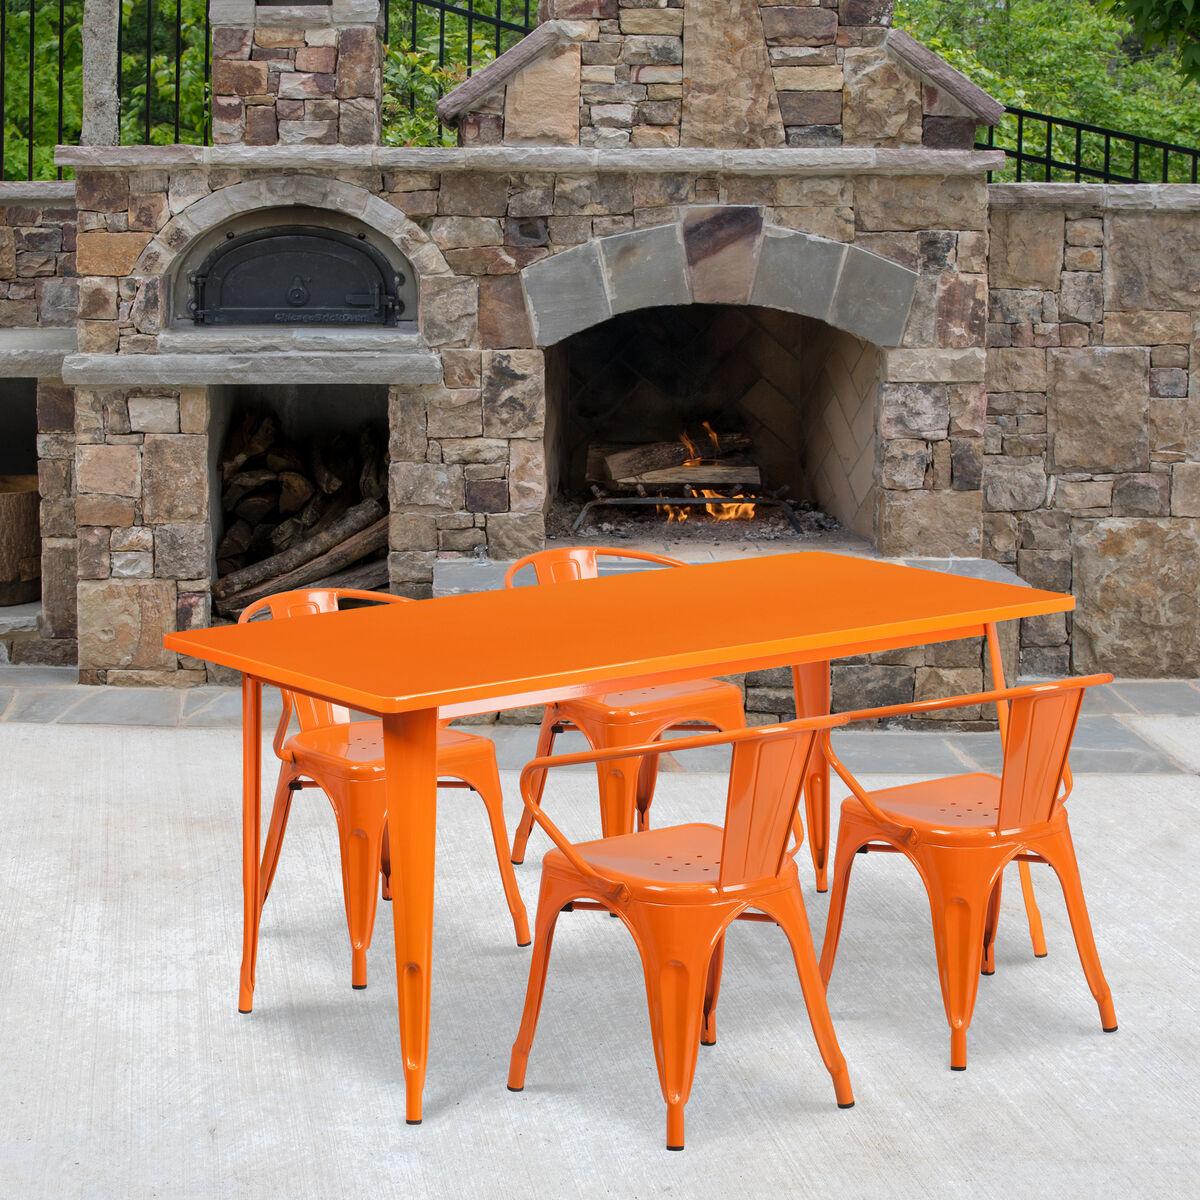 outdoor metal table set wrought iron our 315 63 rectangular orange metal indooroutdoor table set 315x63 etct005470orgg bizchaircom